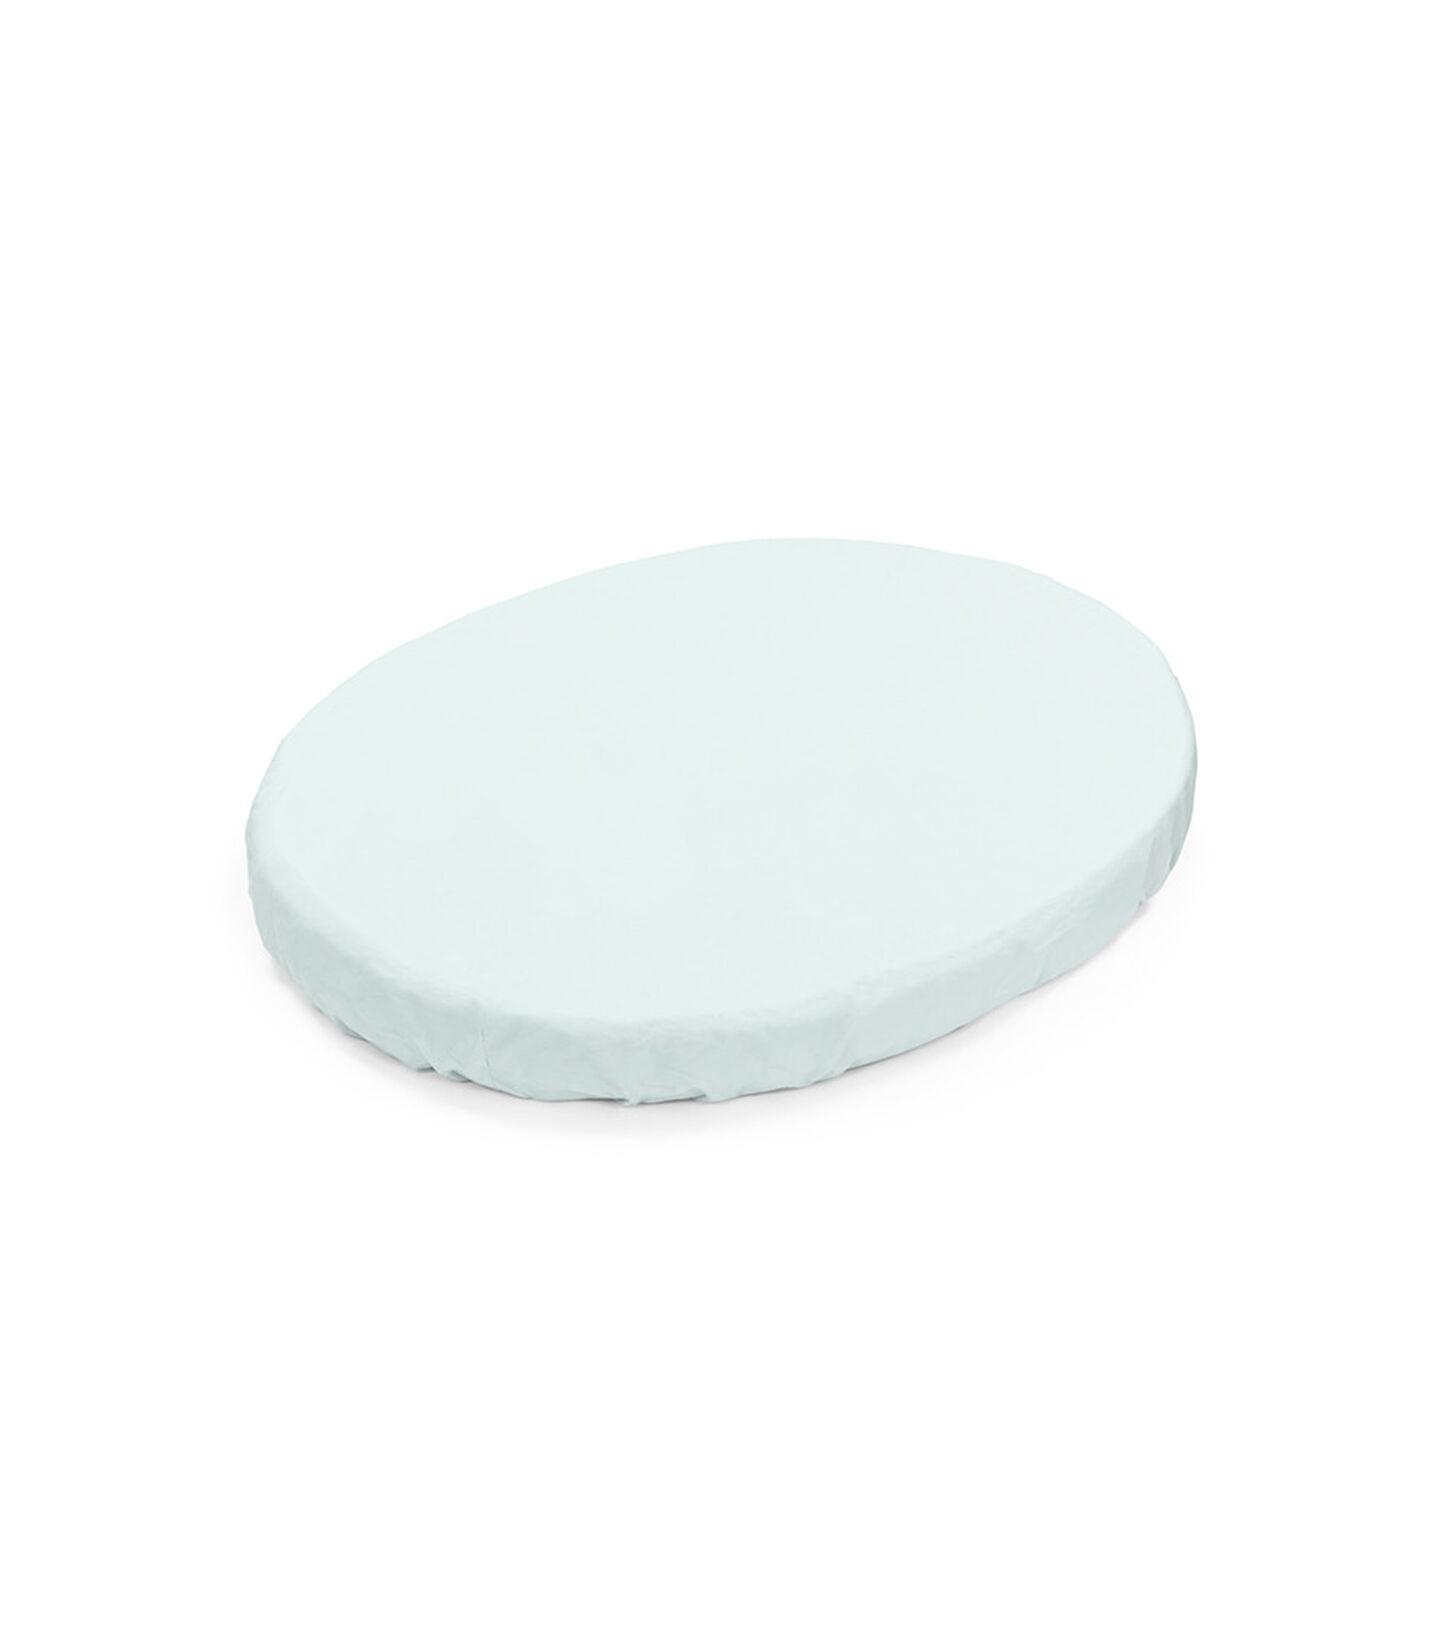 Stokke® Sleepi™ Mini Formsydd laken i Powder Blue, Powder Blue, mainview view 1